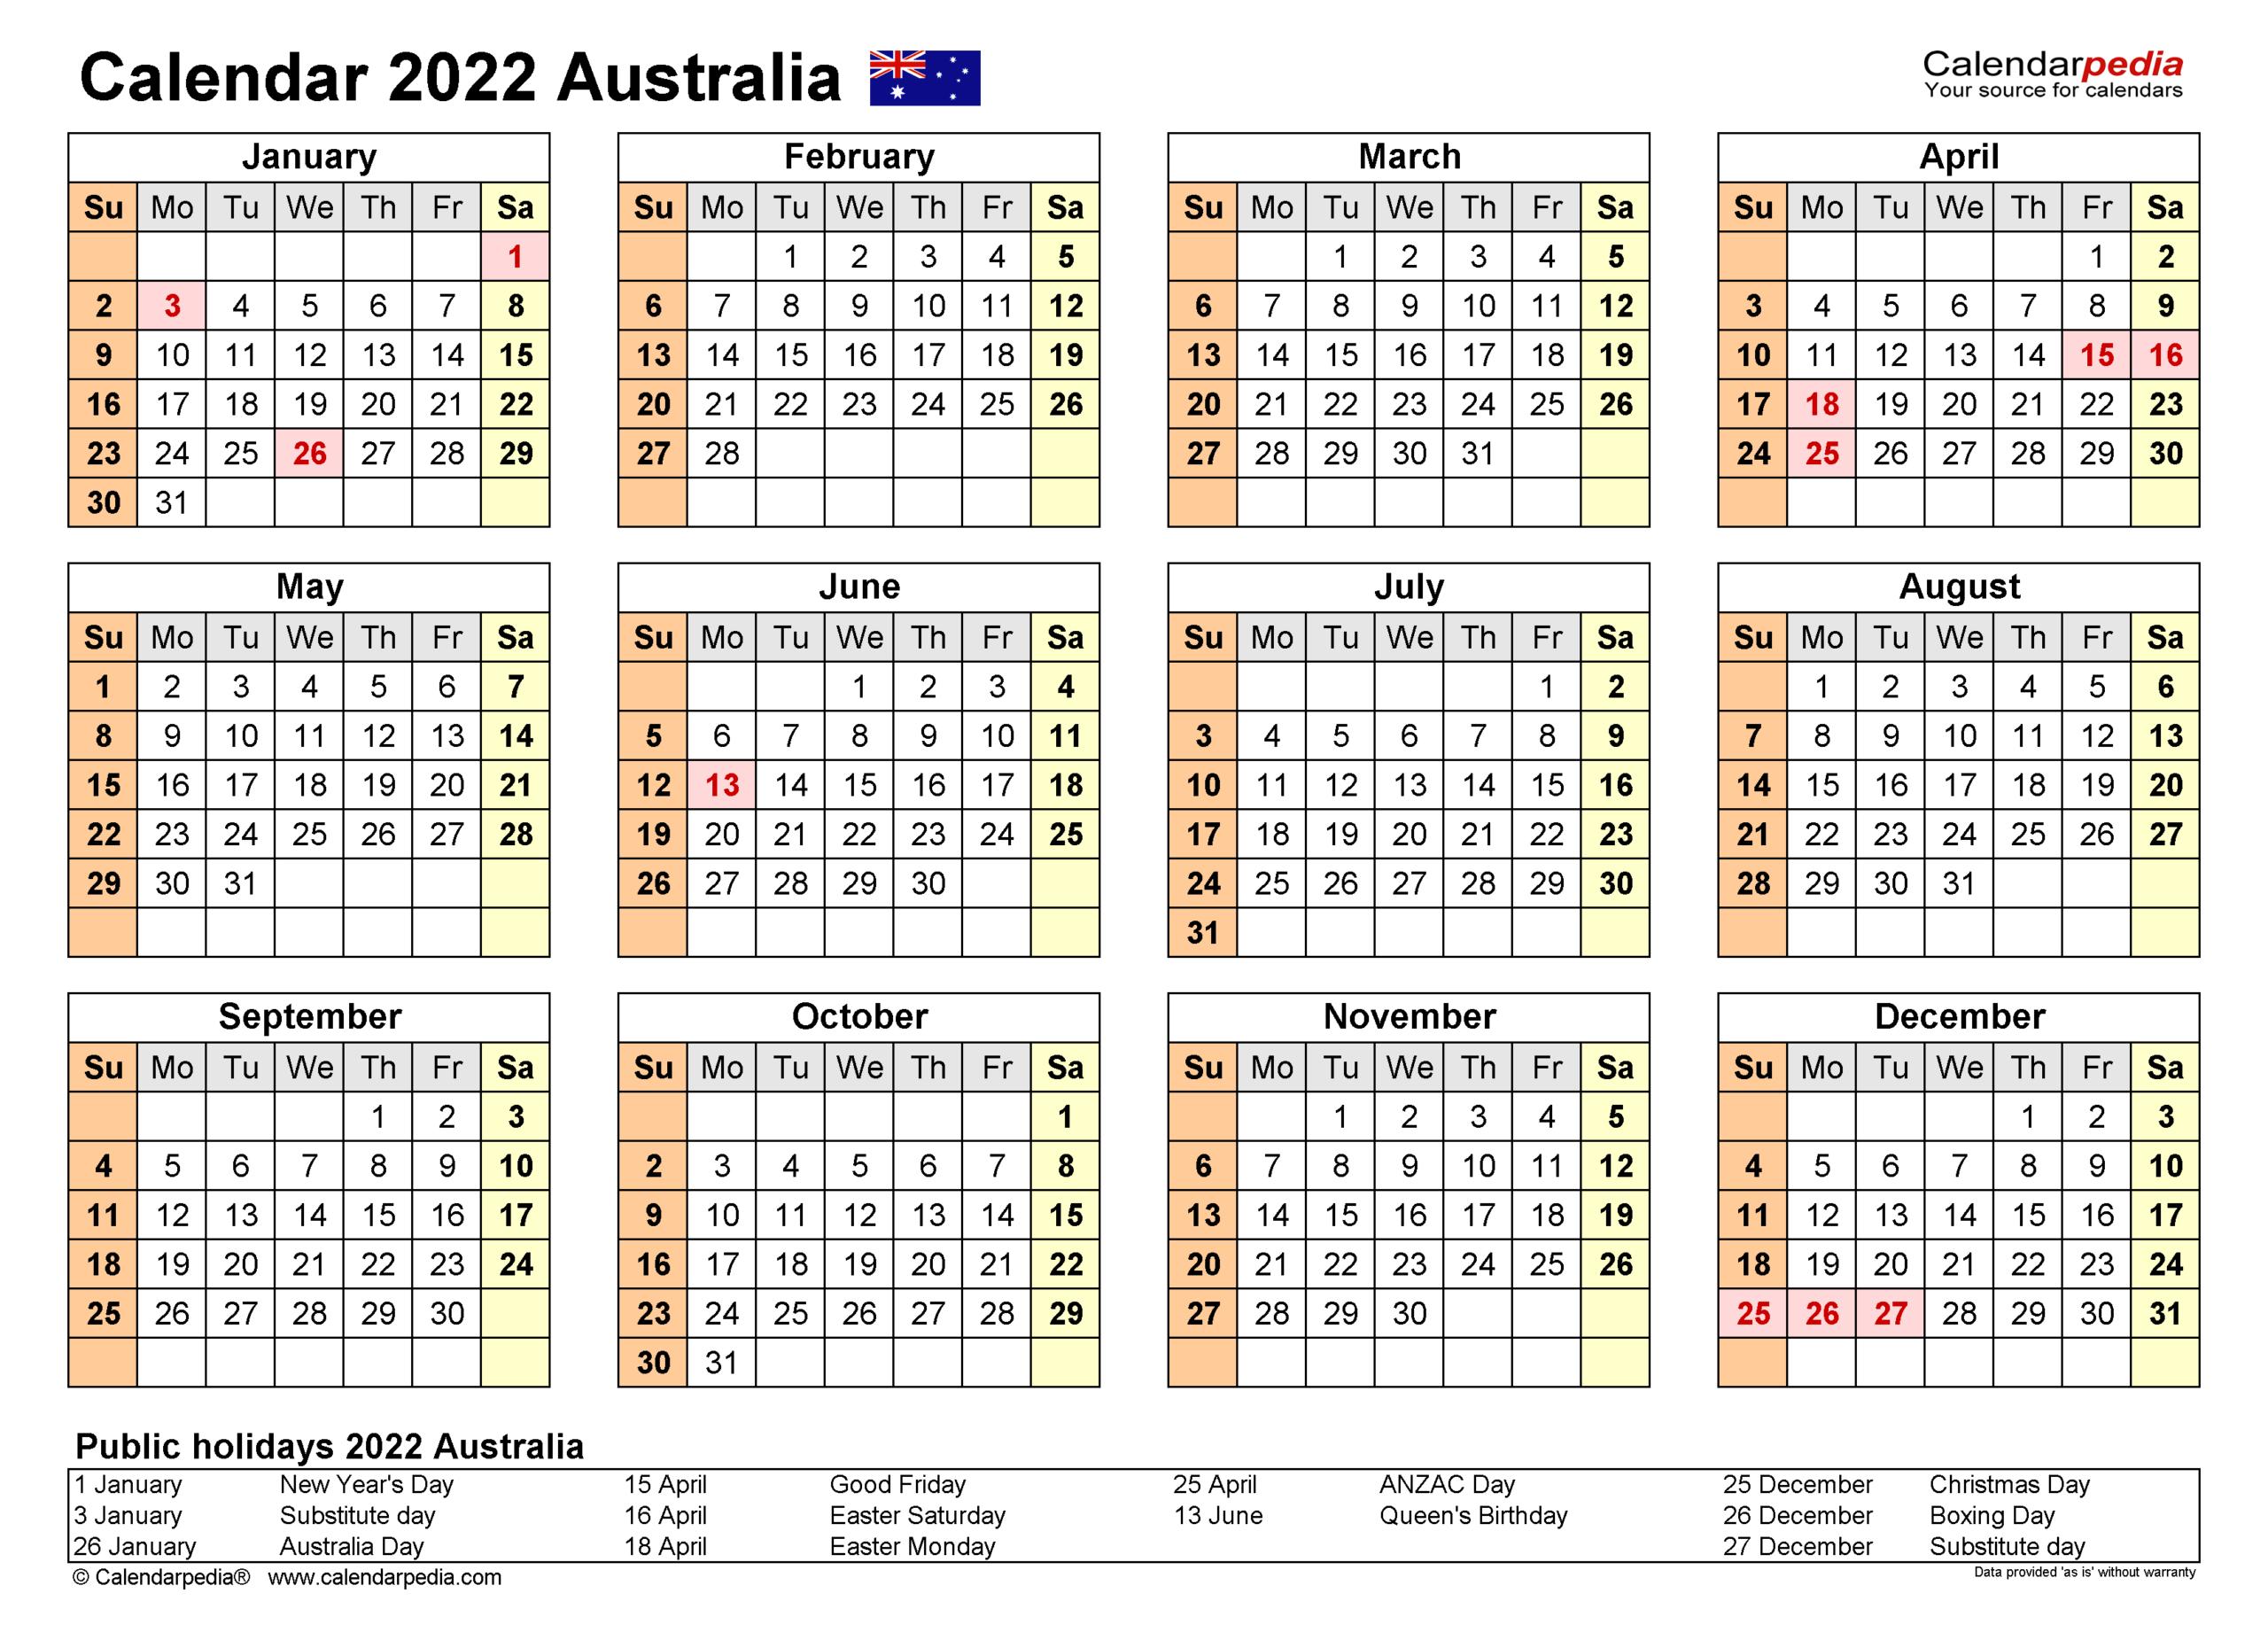 Australia Calendar 2022 - Free Printable Excel Templates in 2021-2022 Three Year Planner: 3 Year